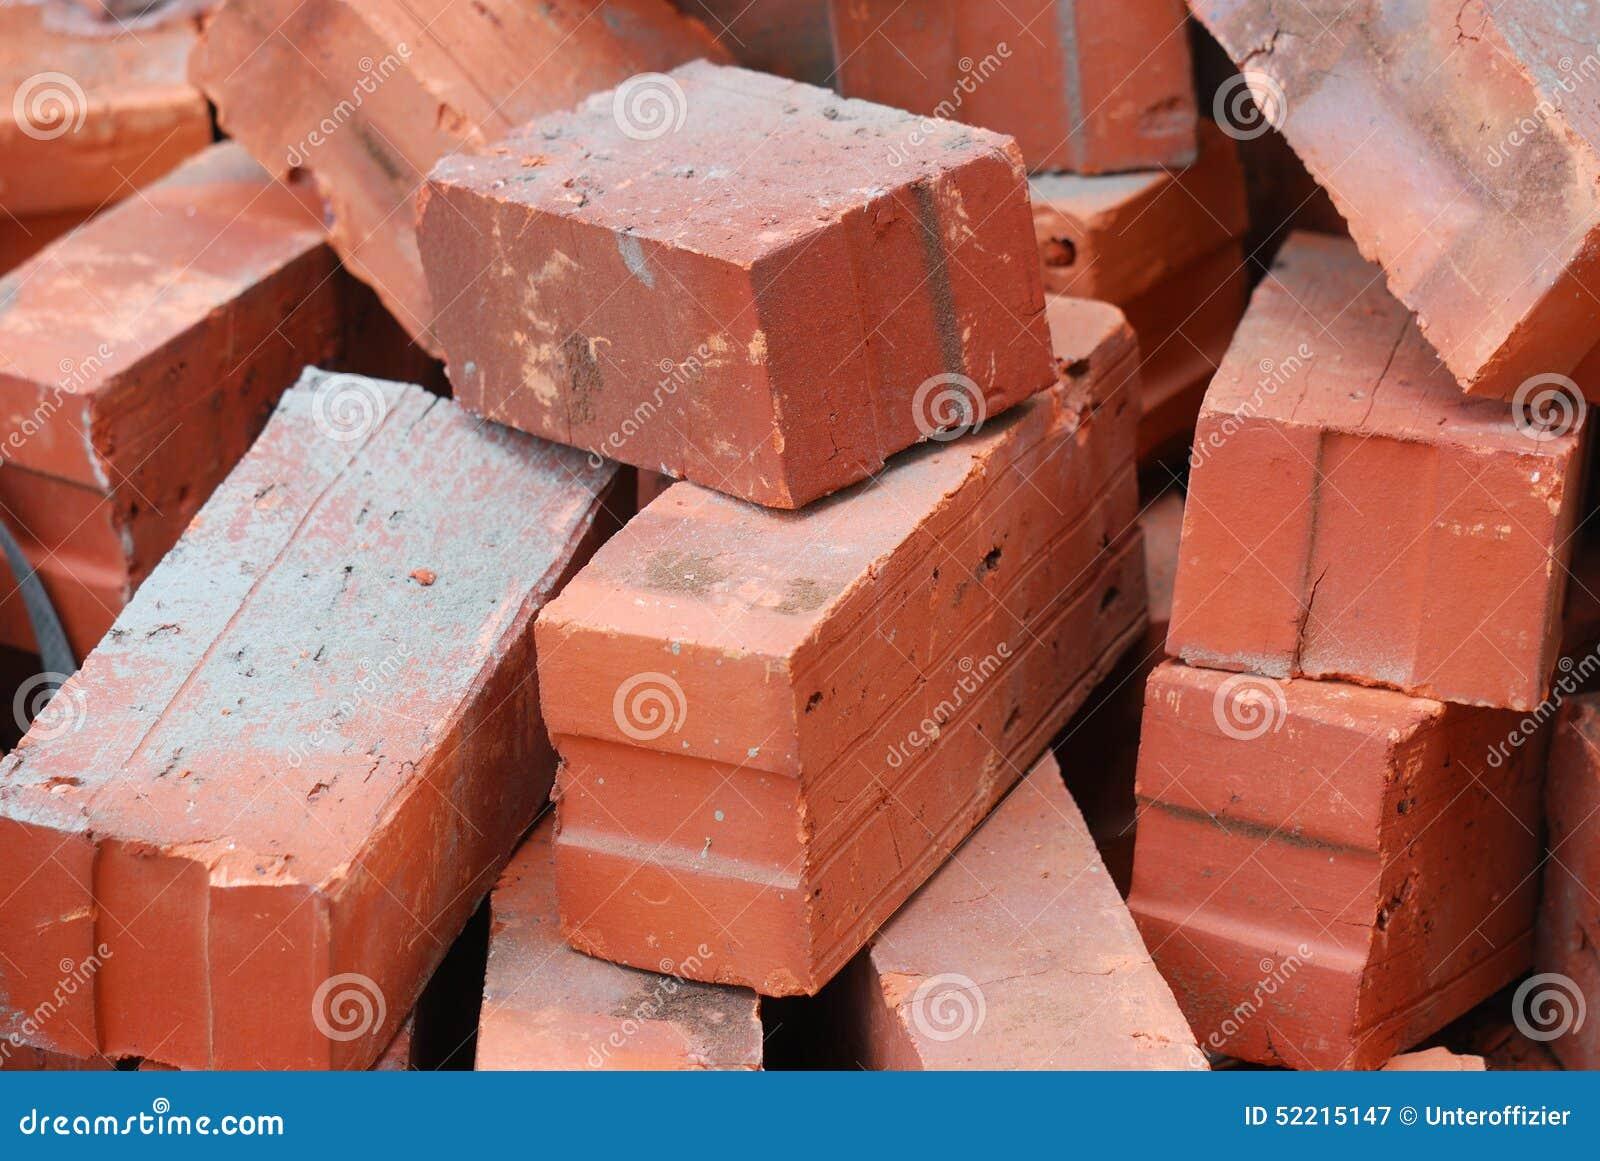 Download Red Bricks stock image. Image of house, fragile, brick - 52215147